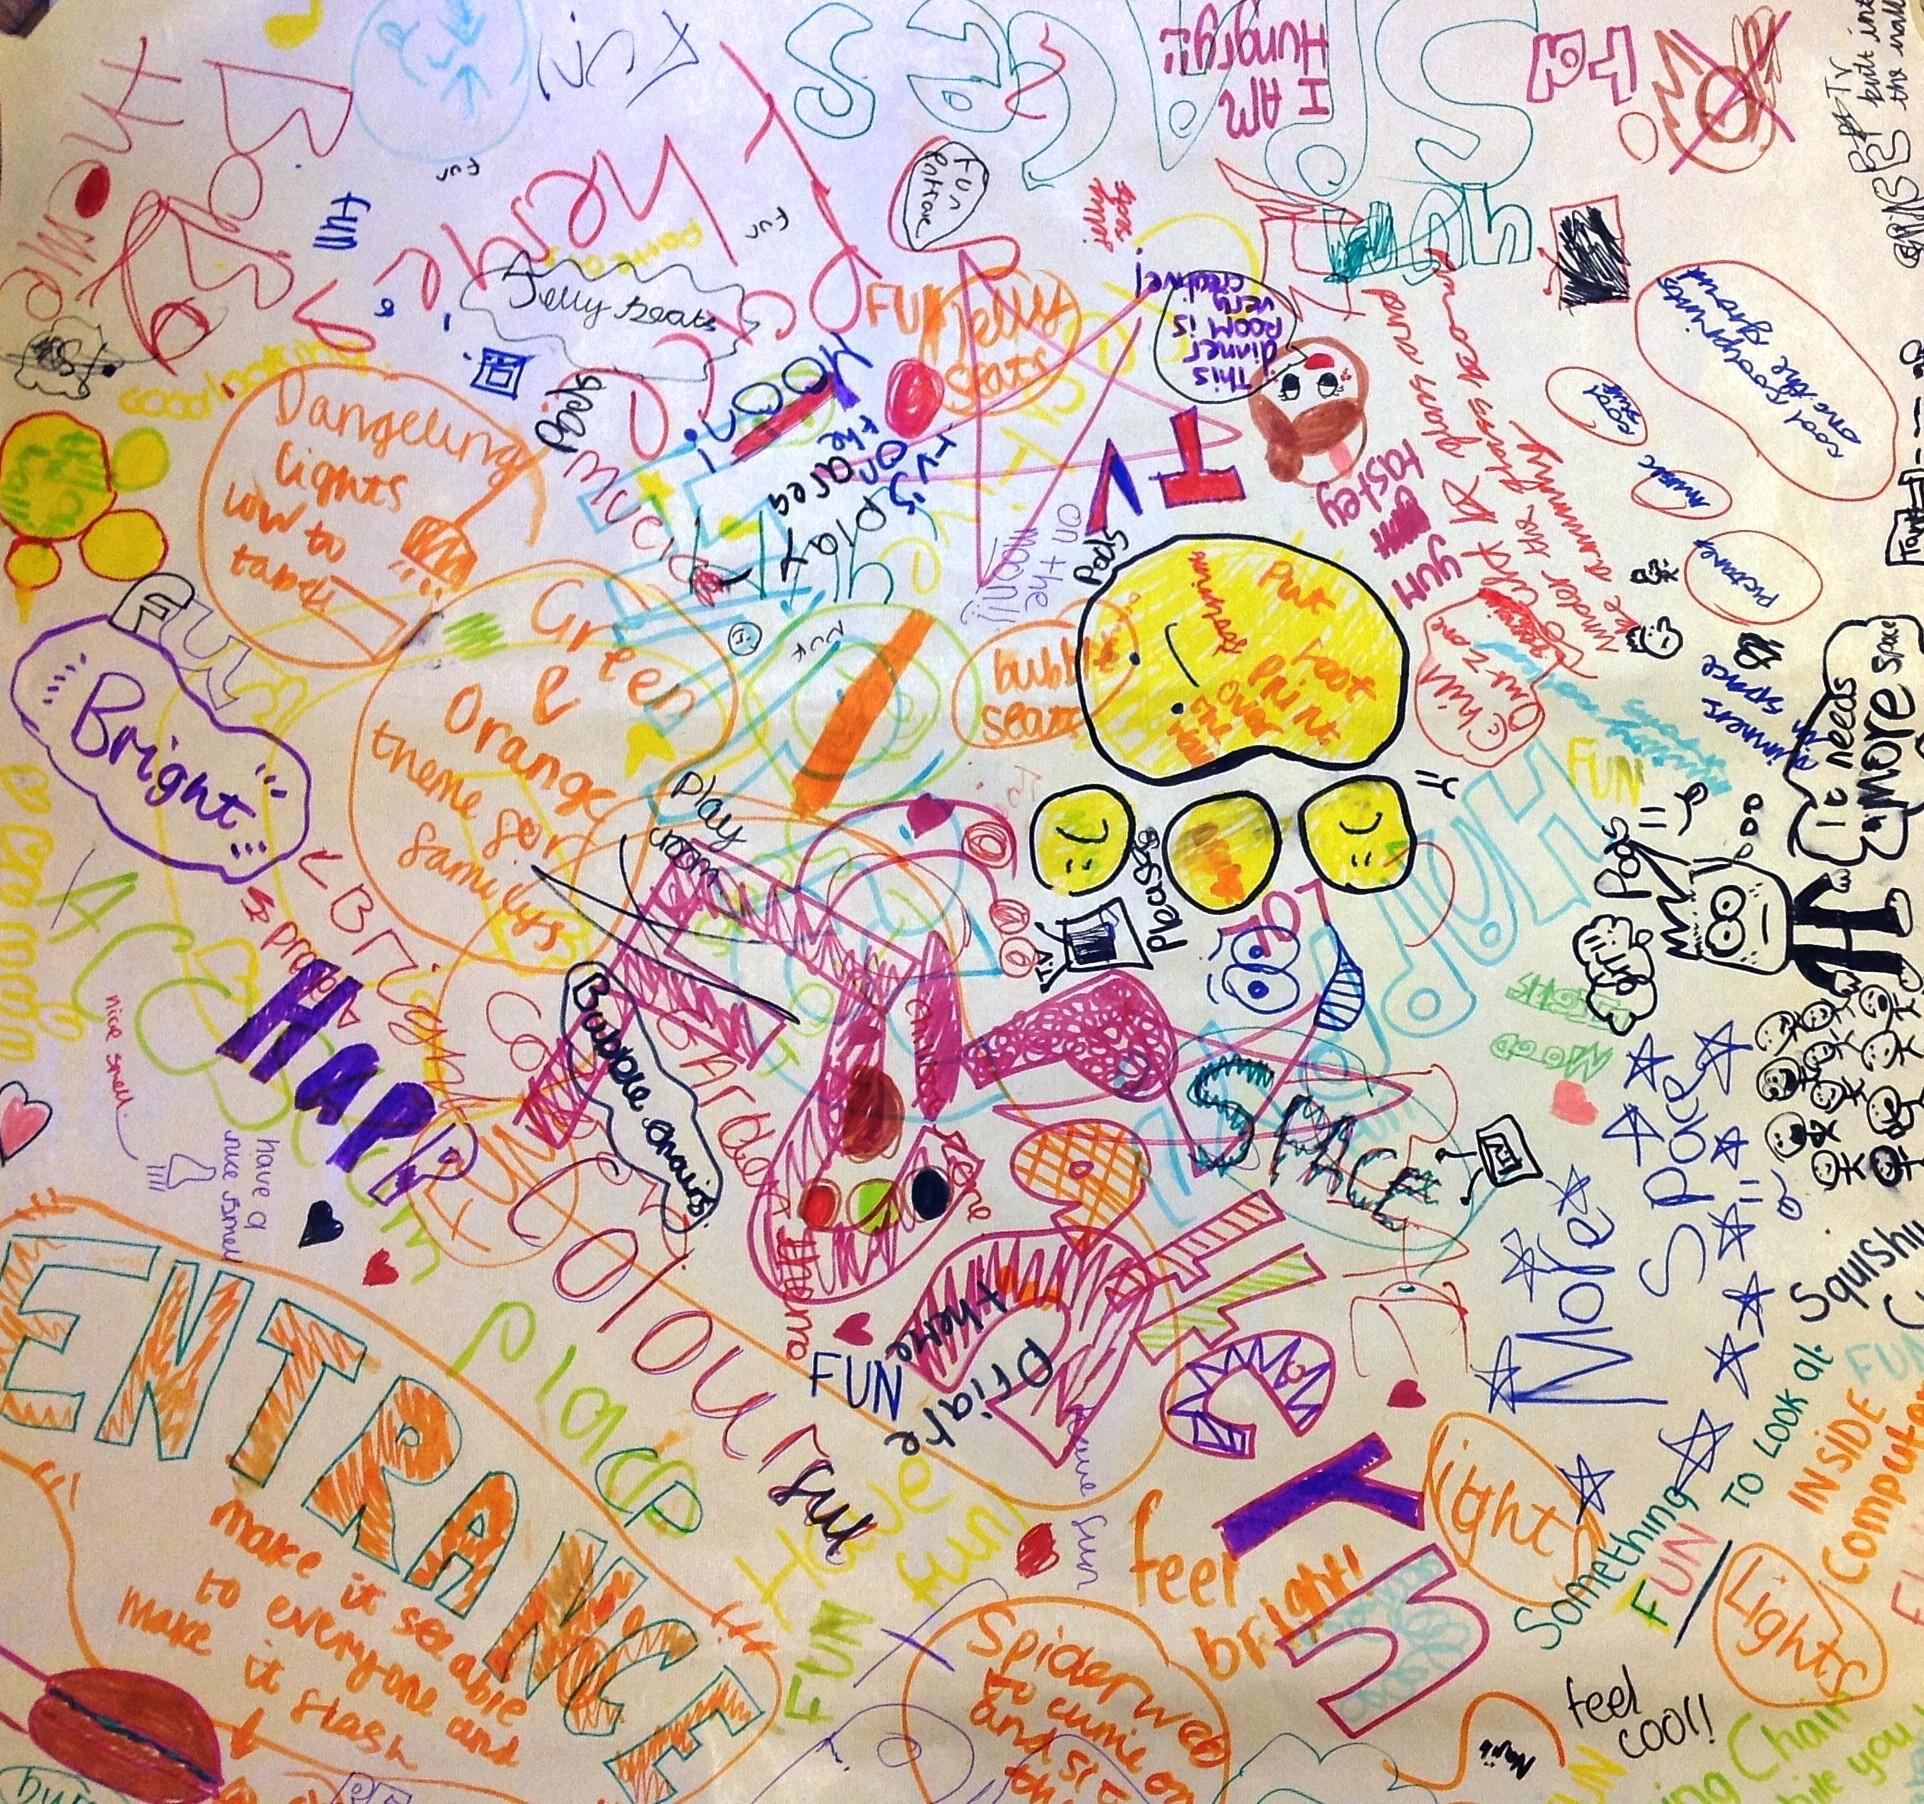 Graffiti Art Wallpapers Group 71: HD Graffiti Desktop Wallpapers (71+ Images